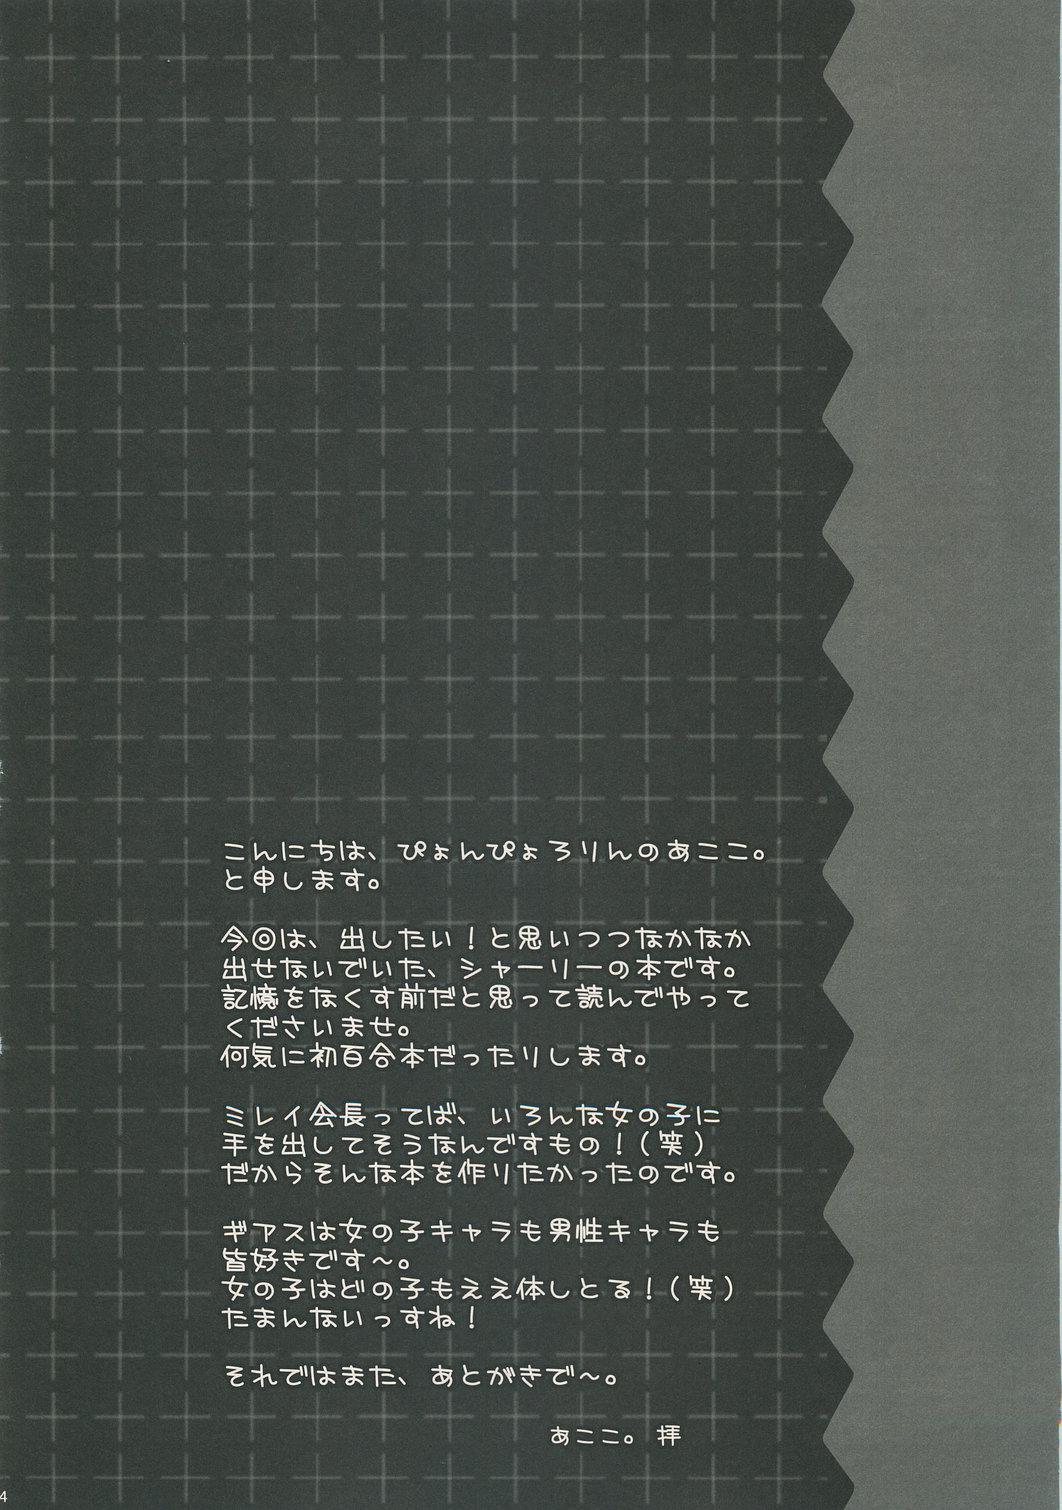 Youkoso, Ura Seitokai e! 2